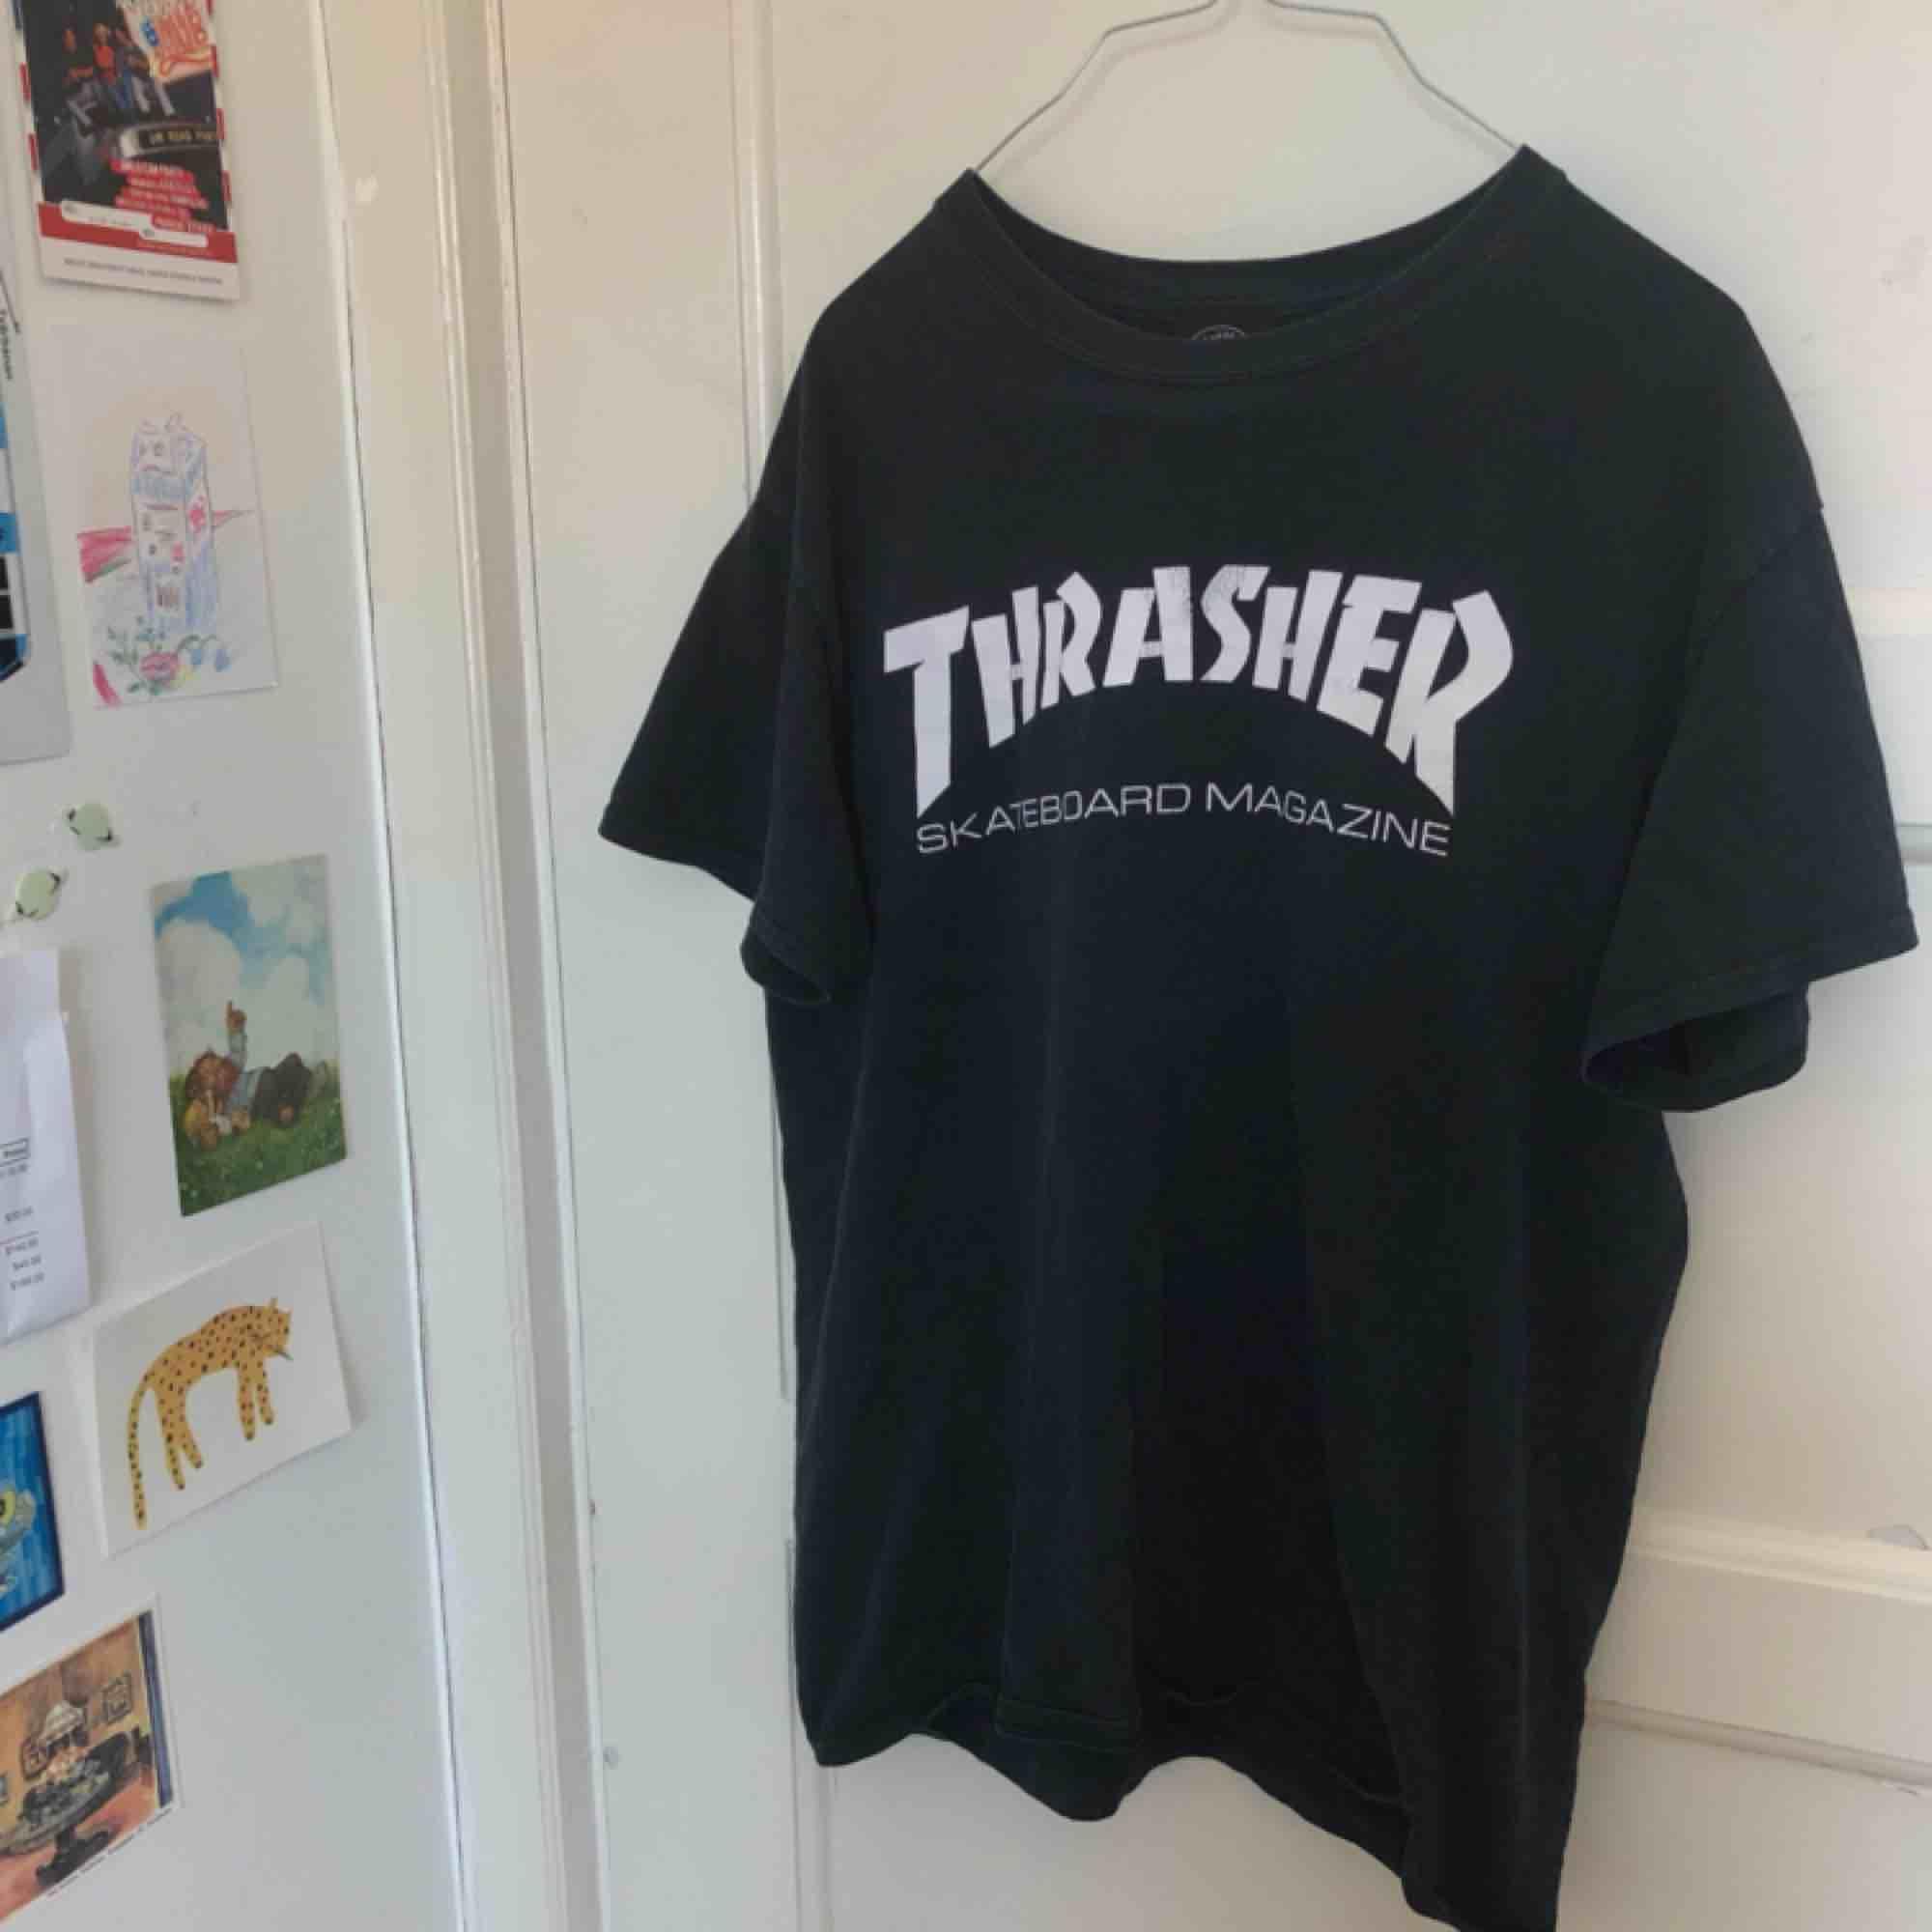 Vintage/retro t-shirt från Thrasher! Inköpt second hand på Beyond Retro. Storlek M ❤️💙. T-shirts.